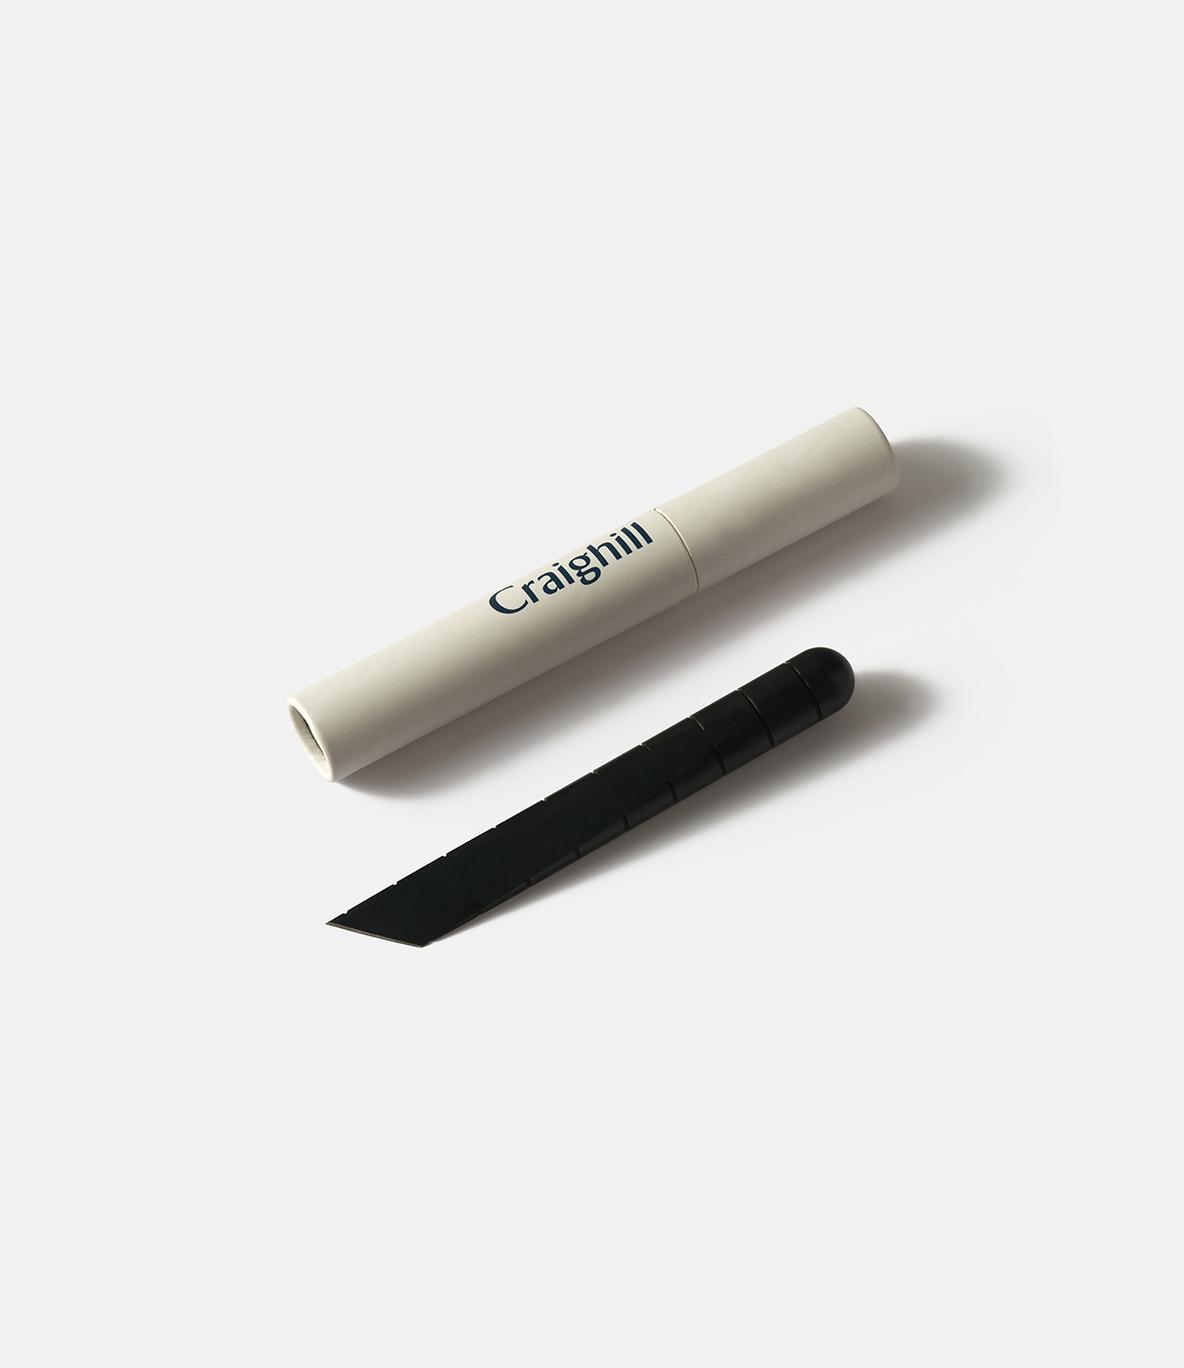 Craighill Desk Knife Carbon Black — настольный нож из стали: чёрный